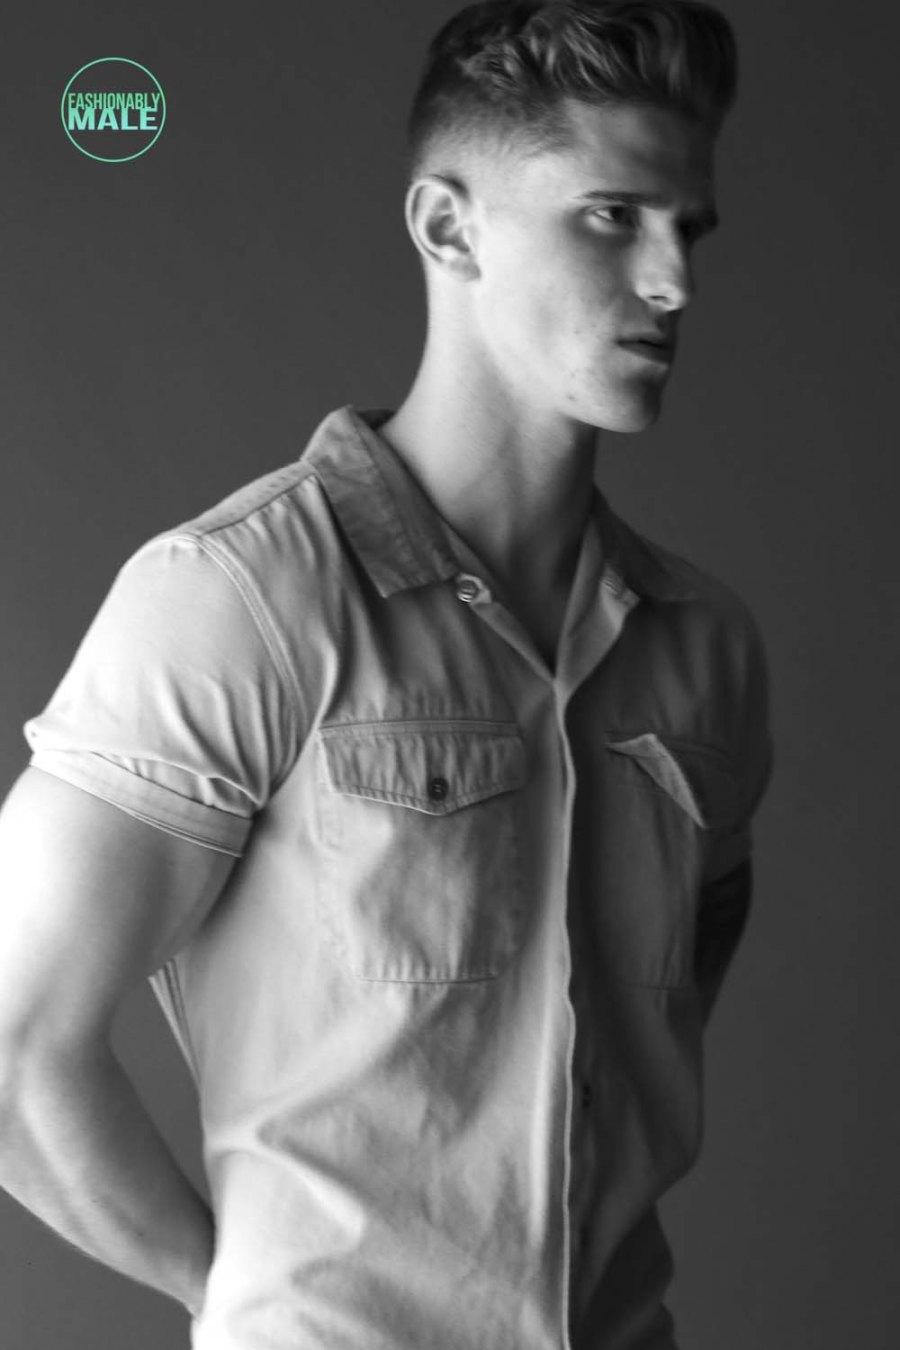 Matt van de Sande by Michael del Buono5